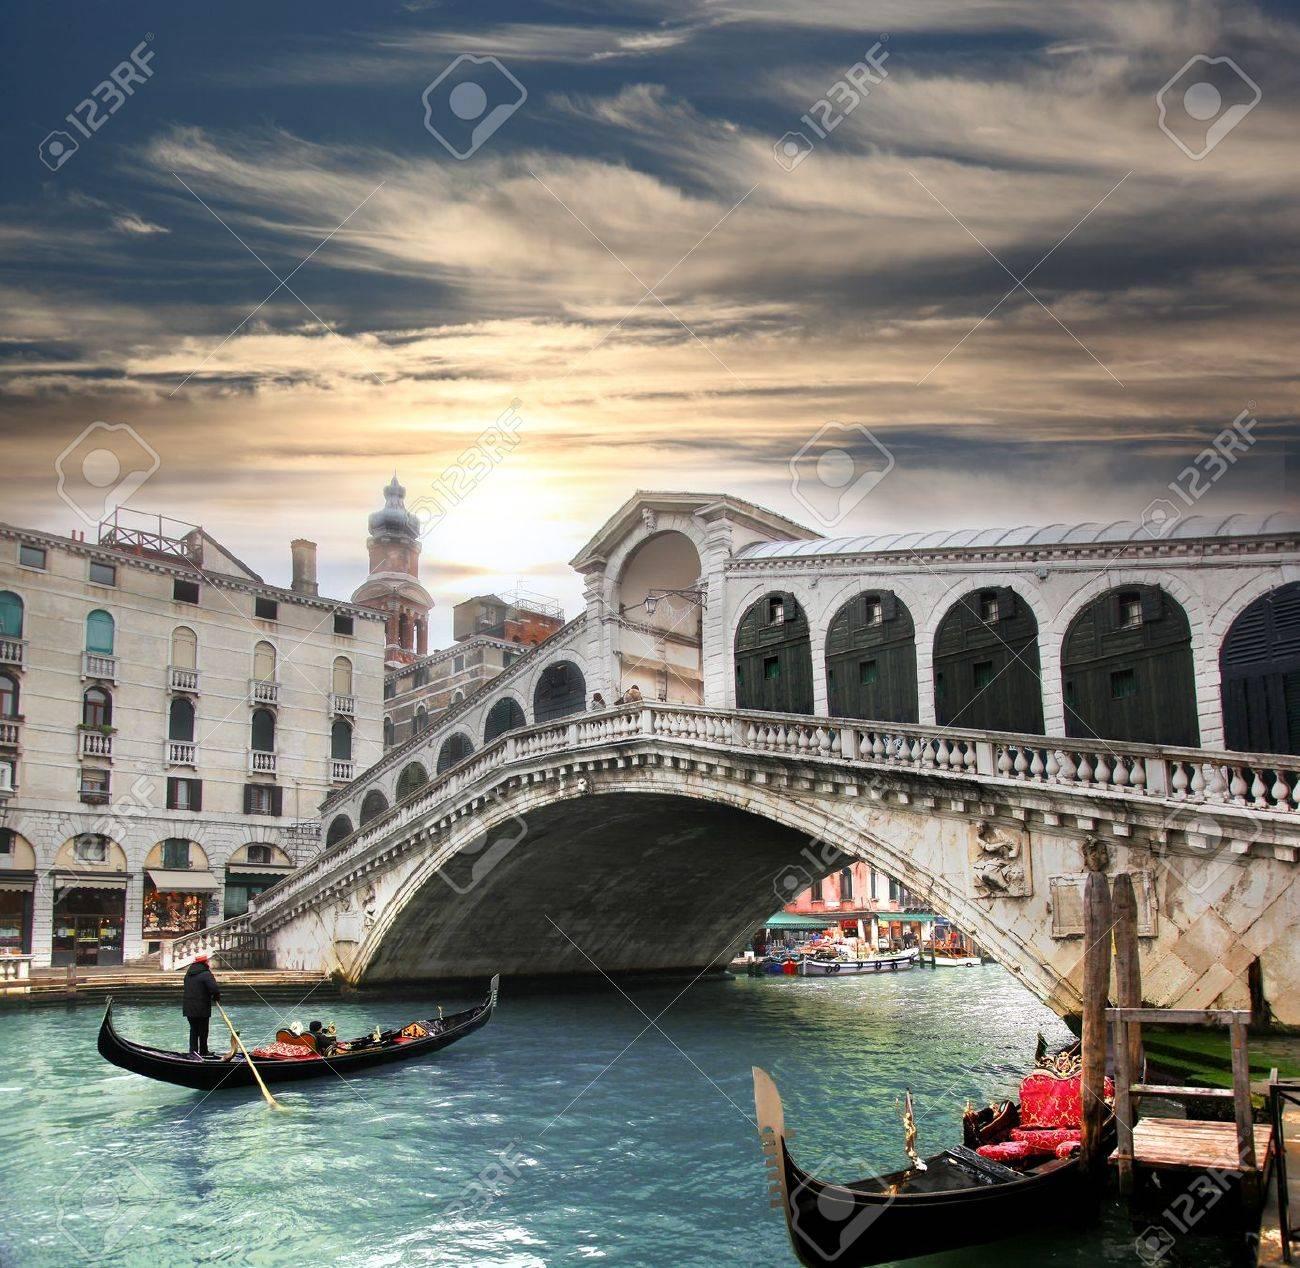 Venice, Rialto bridge and with gondola on Grand Canal, Italy - 18105732